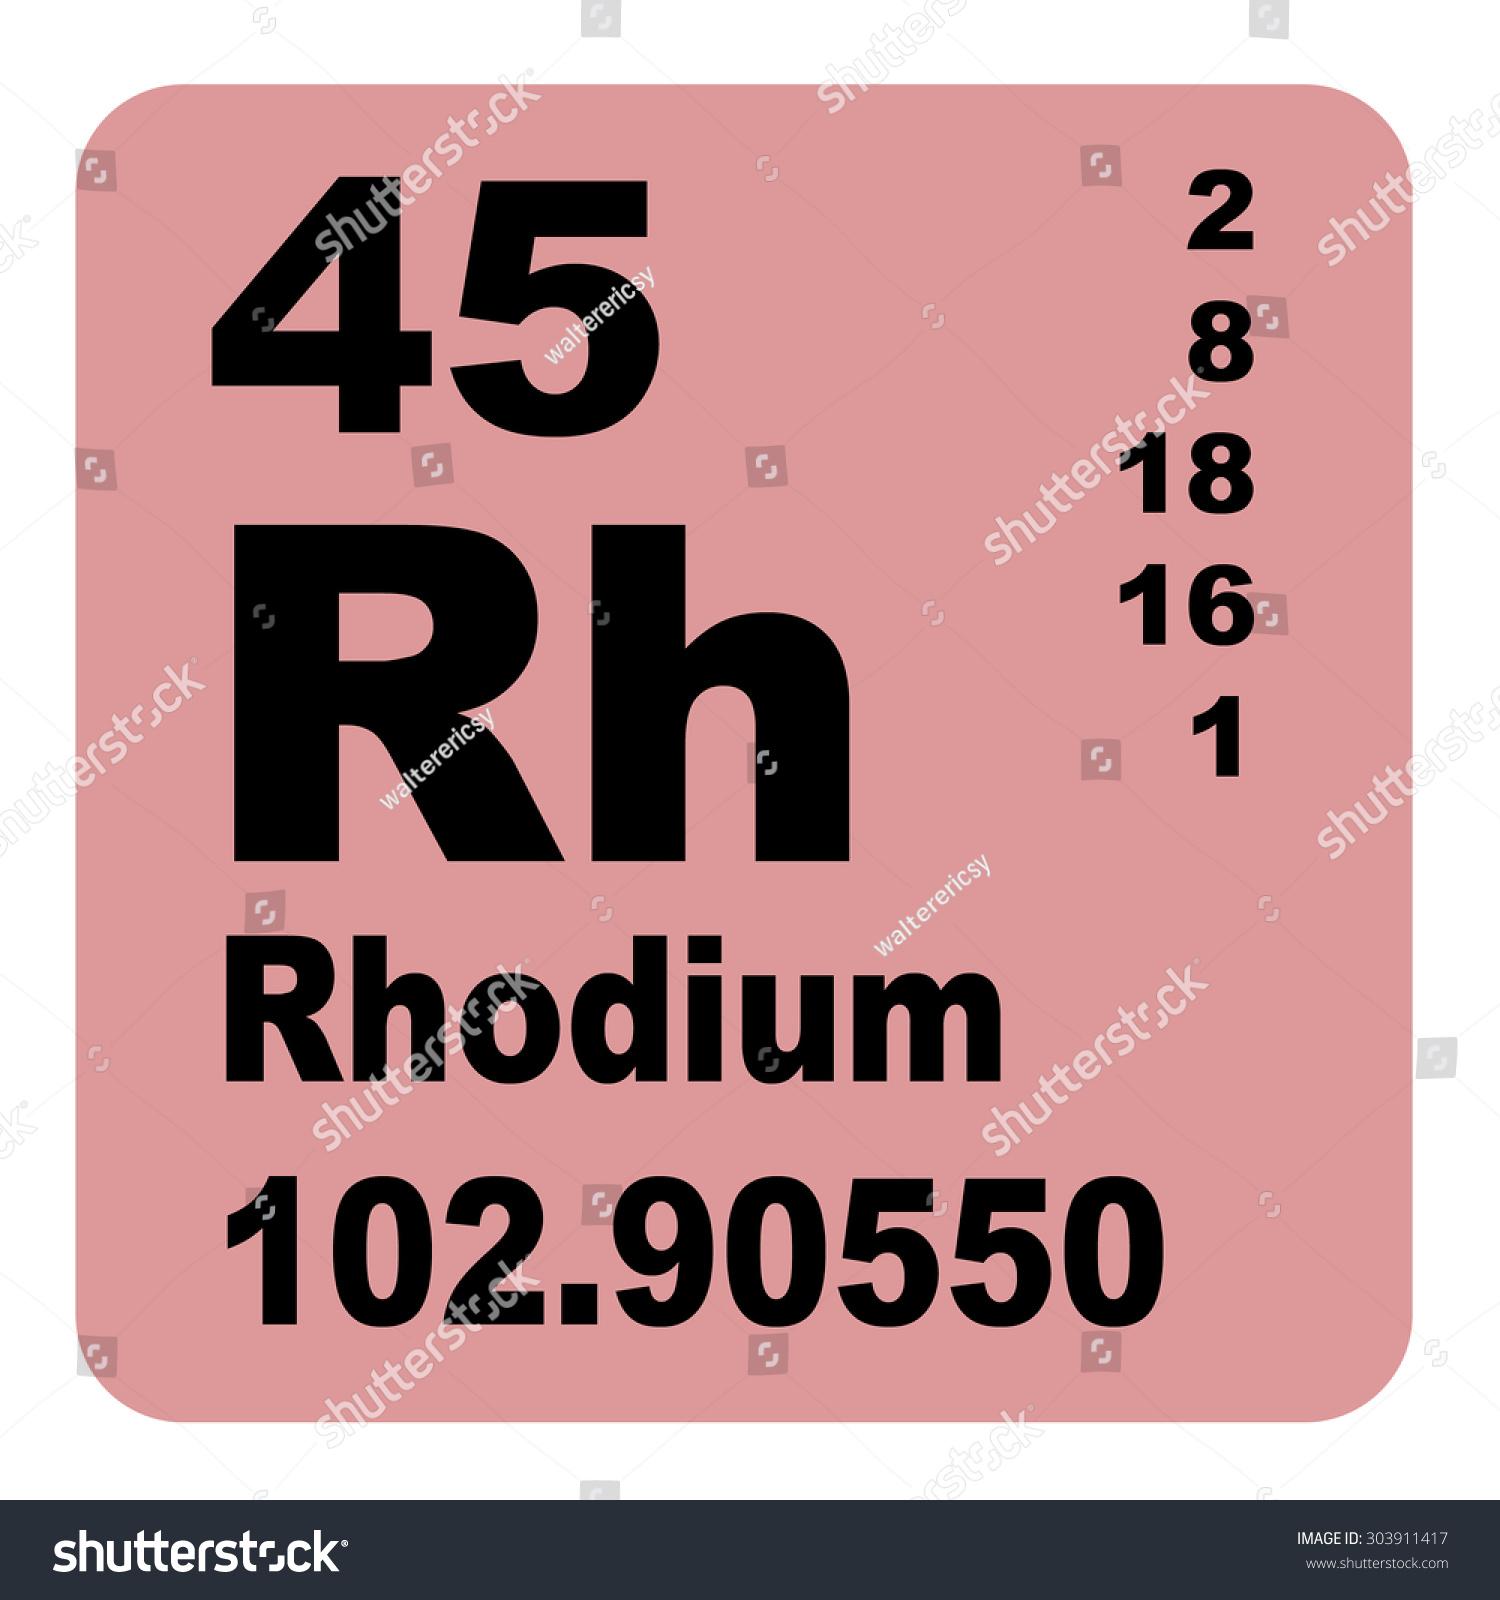 Rhodium periodic table elements stock illustration 303911417 rhodium periodic table of elements gamestrikefo Images